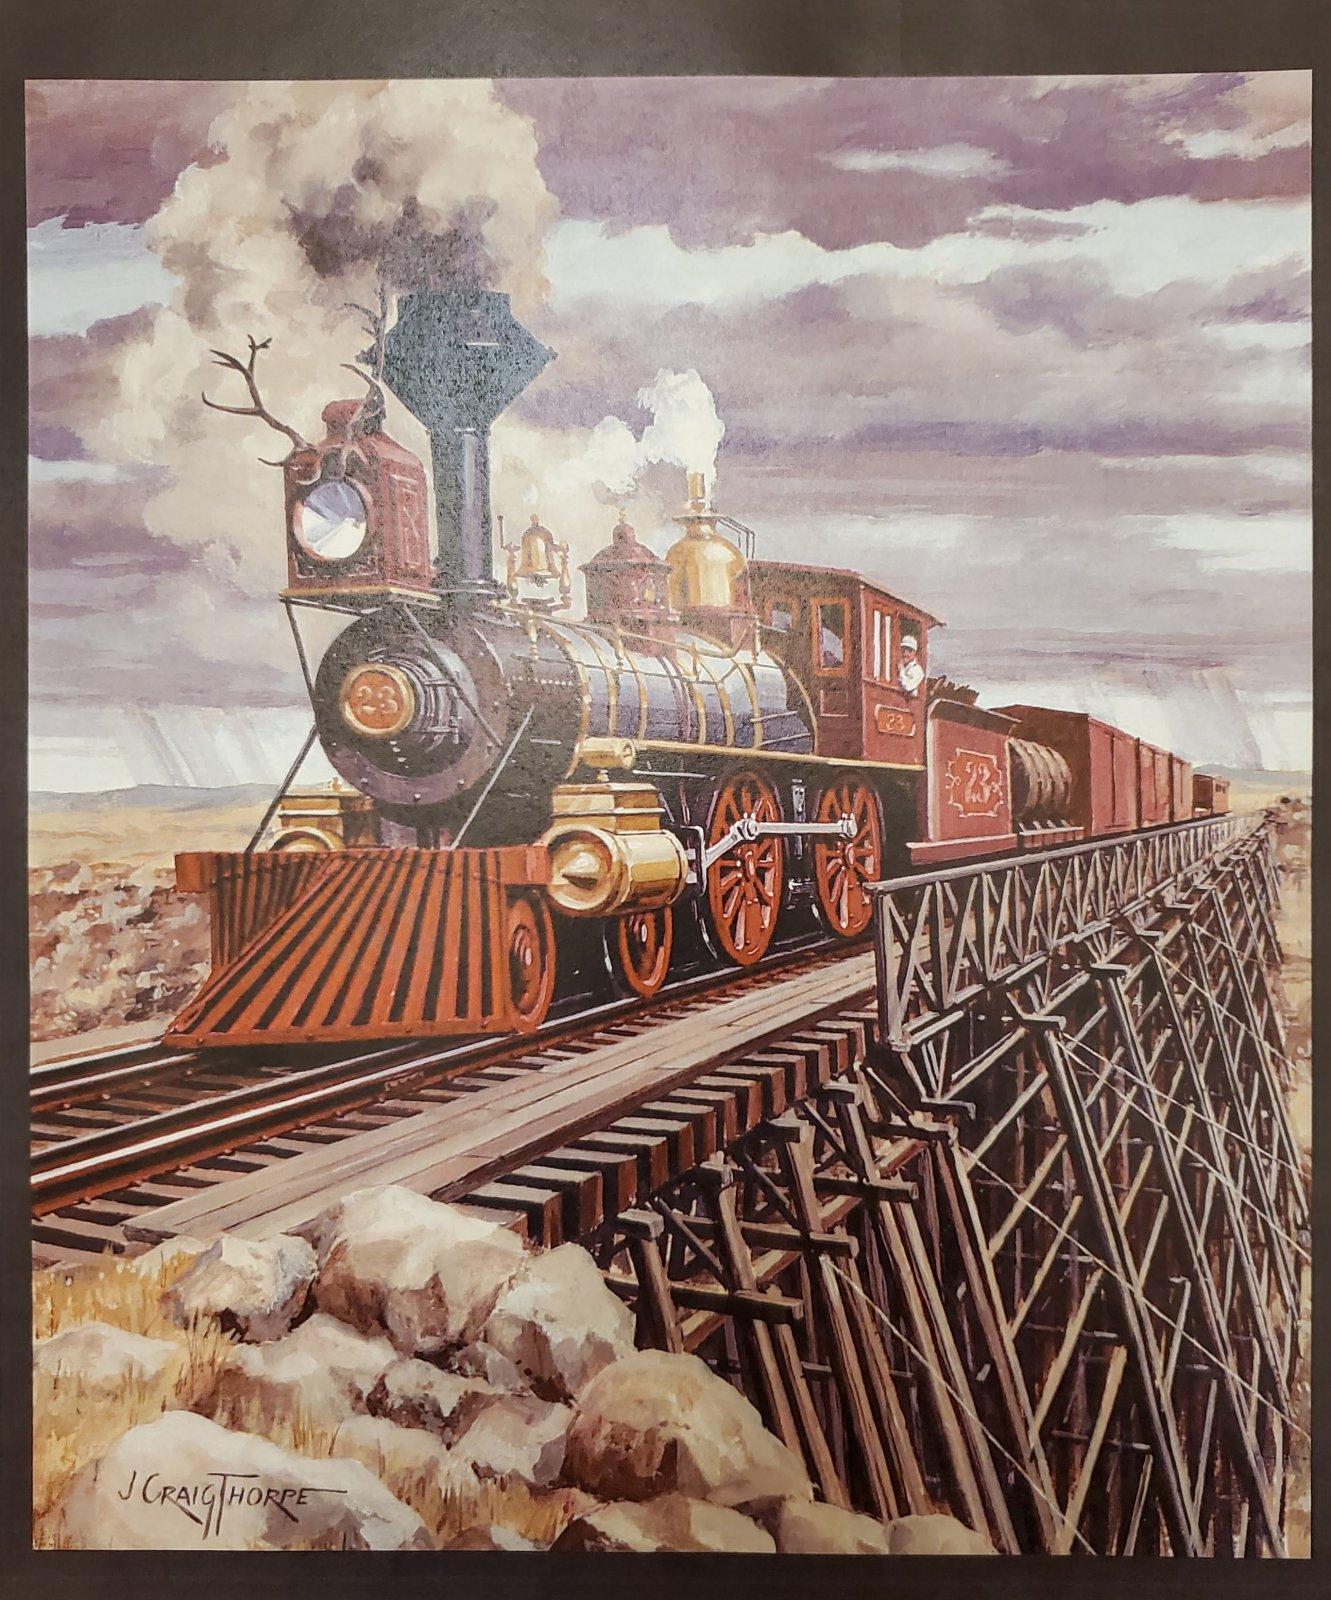 Wyoming Locomotive - Train Engine Panel